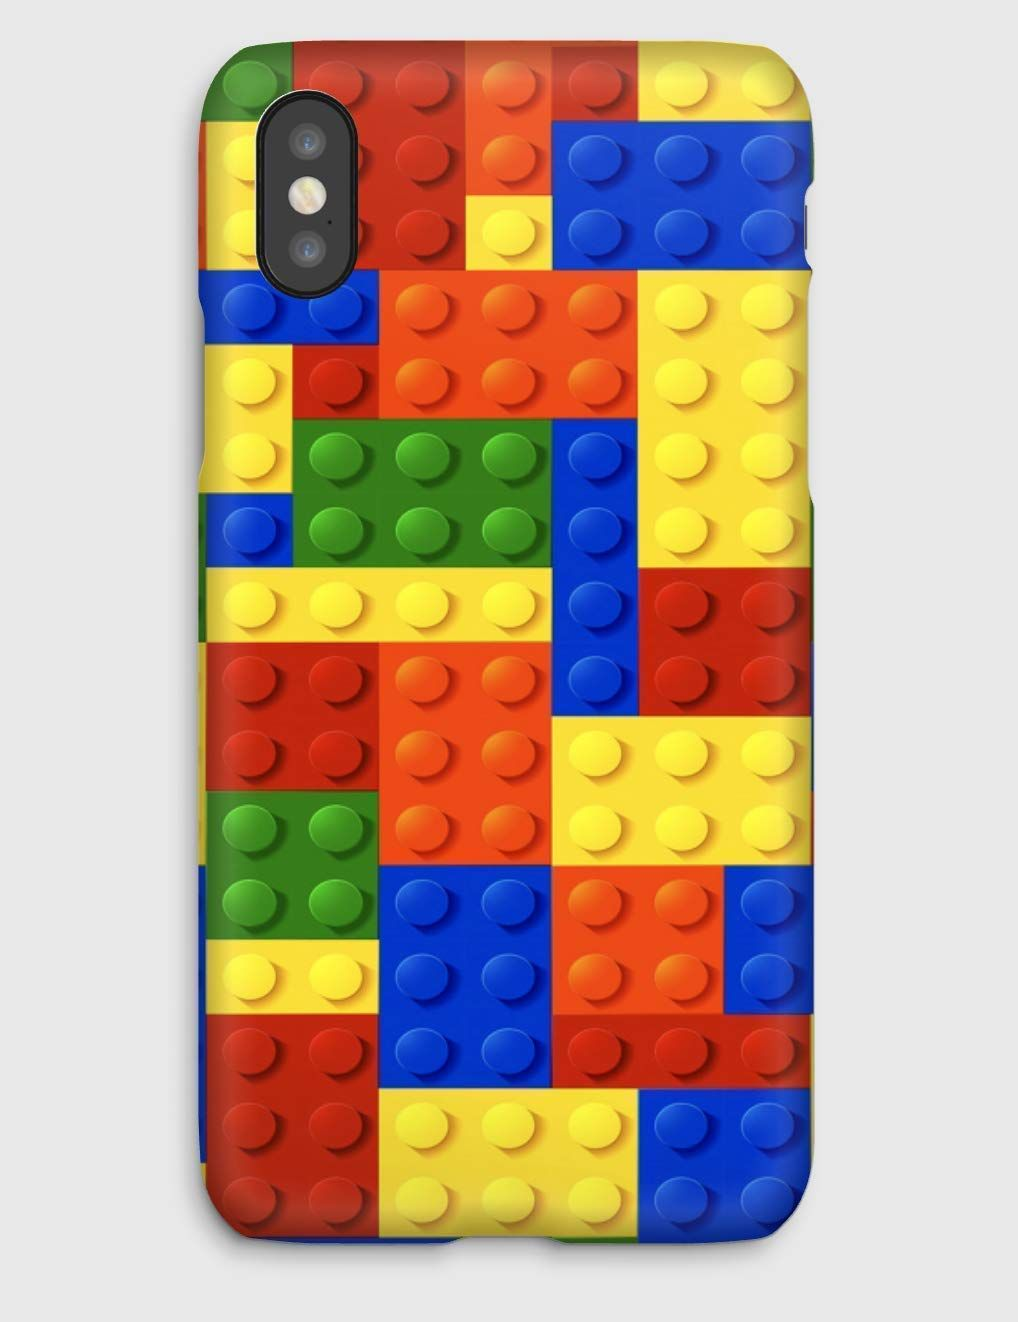 custodia iphone 7 lego